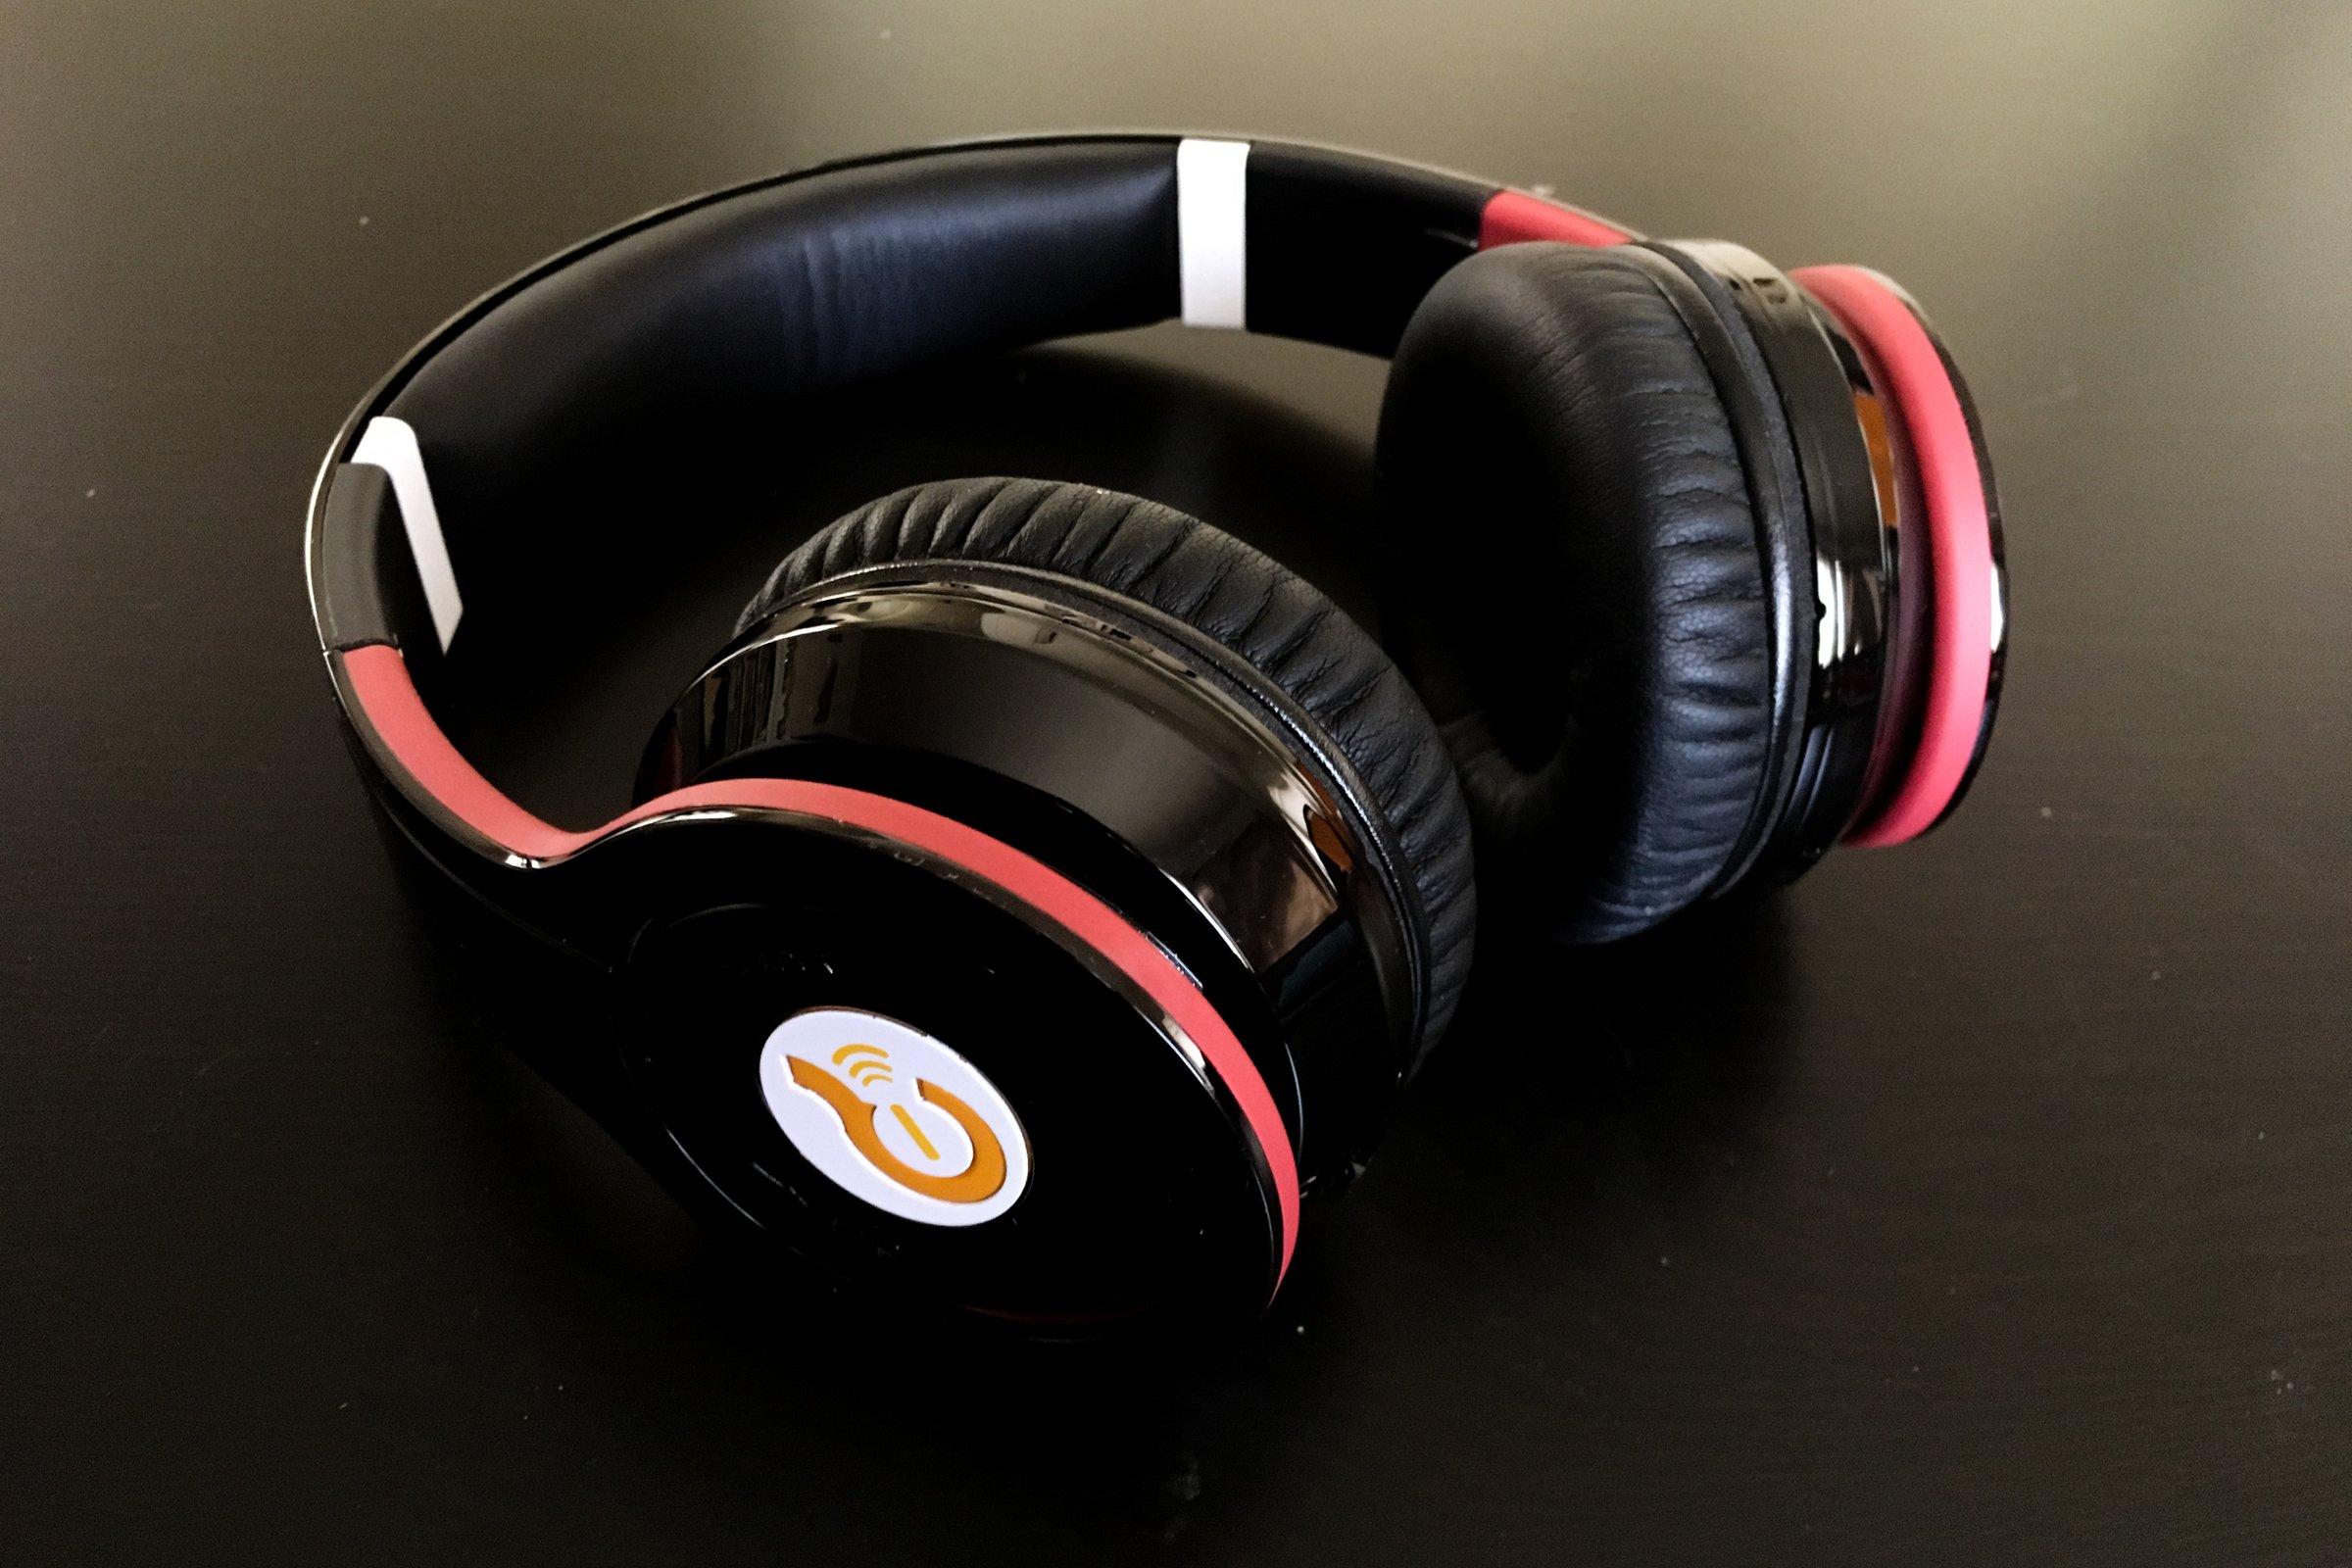 Black & Red Headphones Sitting on Table